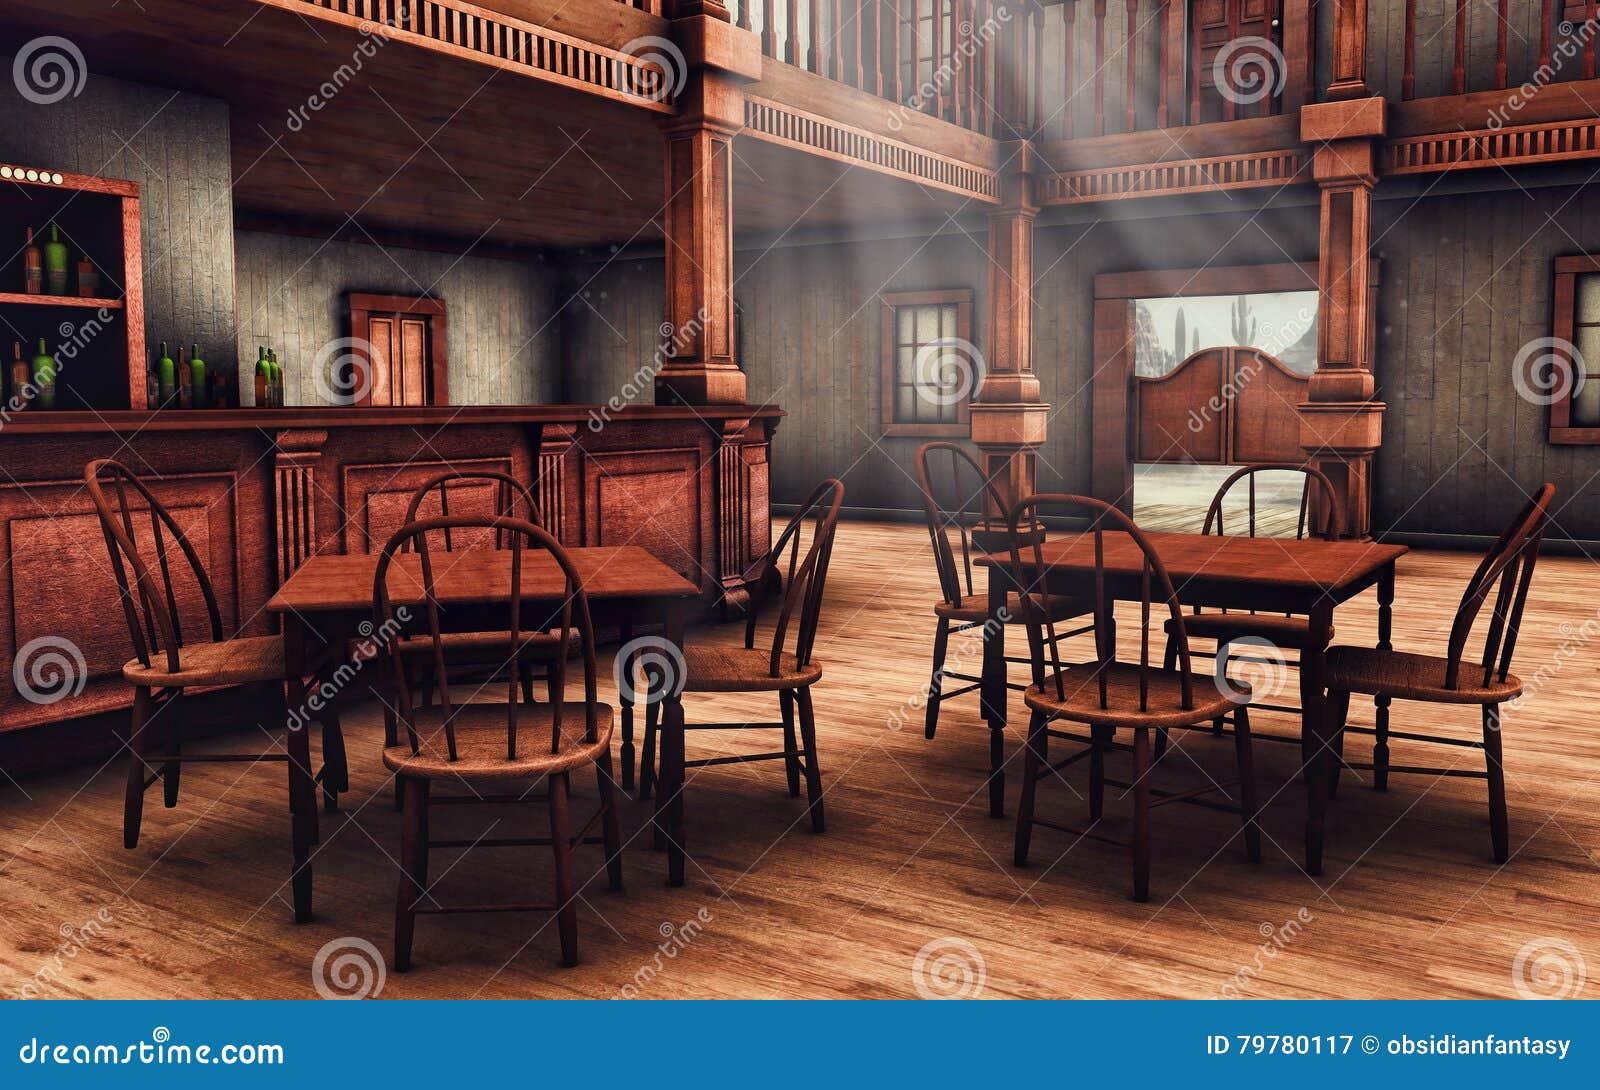 wooden wild west saloon stock illustration illustration of stairs 79780117. Black Bedroom Furniture Sets. Home Design Ideas